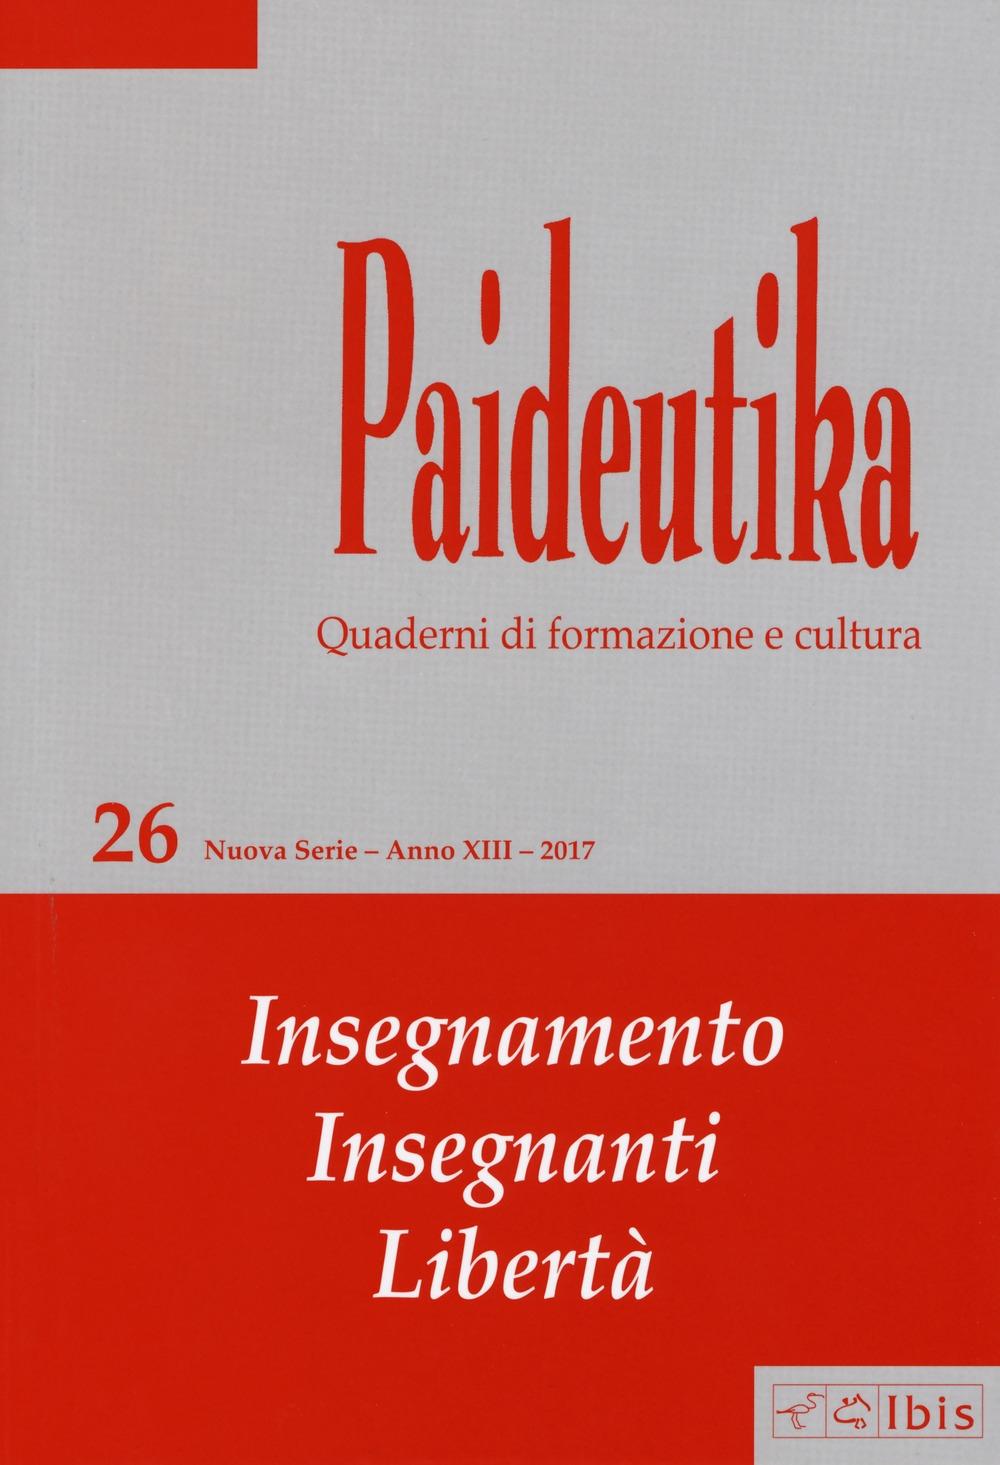 Paideutika. Vol. 26: Insegnamenti, insegnanti, libertà